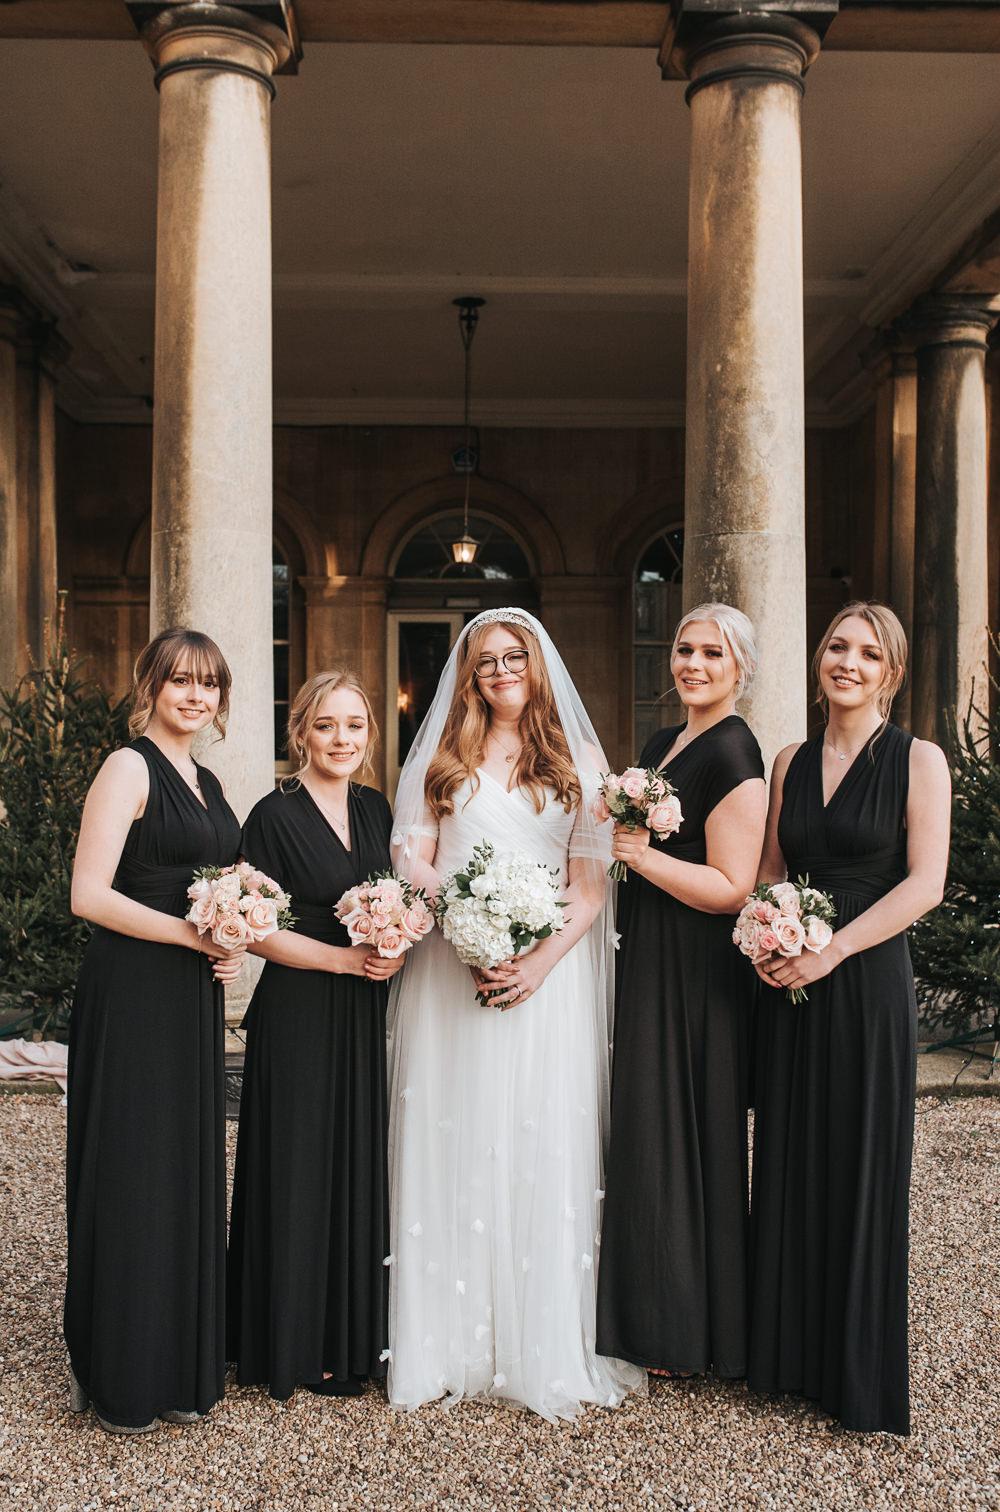 Bridesmaids Bridesmaid Dress Dresses Black Prestwold Hall Wedding Pear & Bear Photography